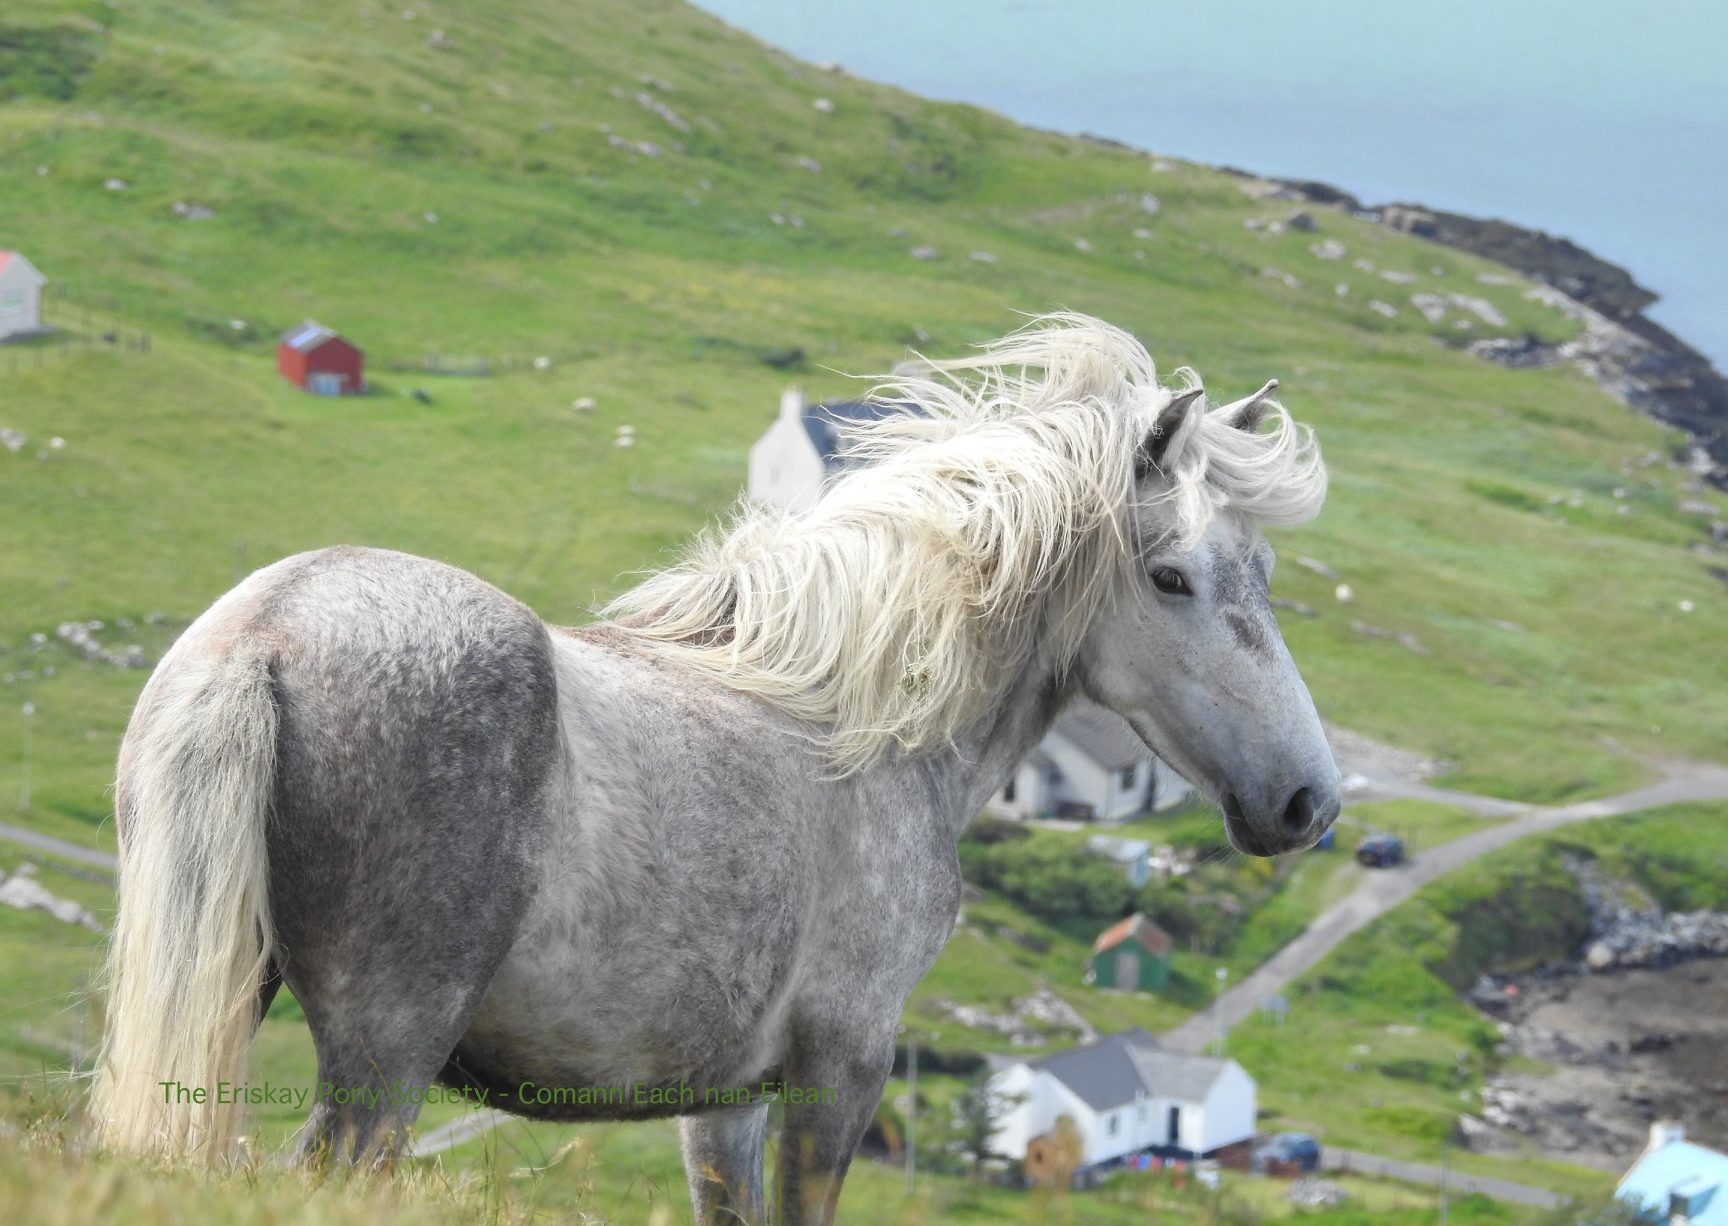 Horse Breed: Eriskay Pony - image via The Eriskay Pony Society - Comann Each nan Eilean - Globetrotting horse riding holidays